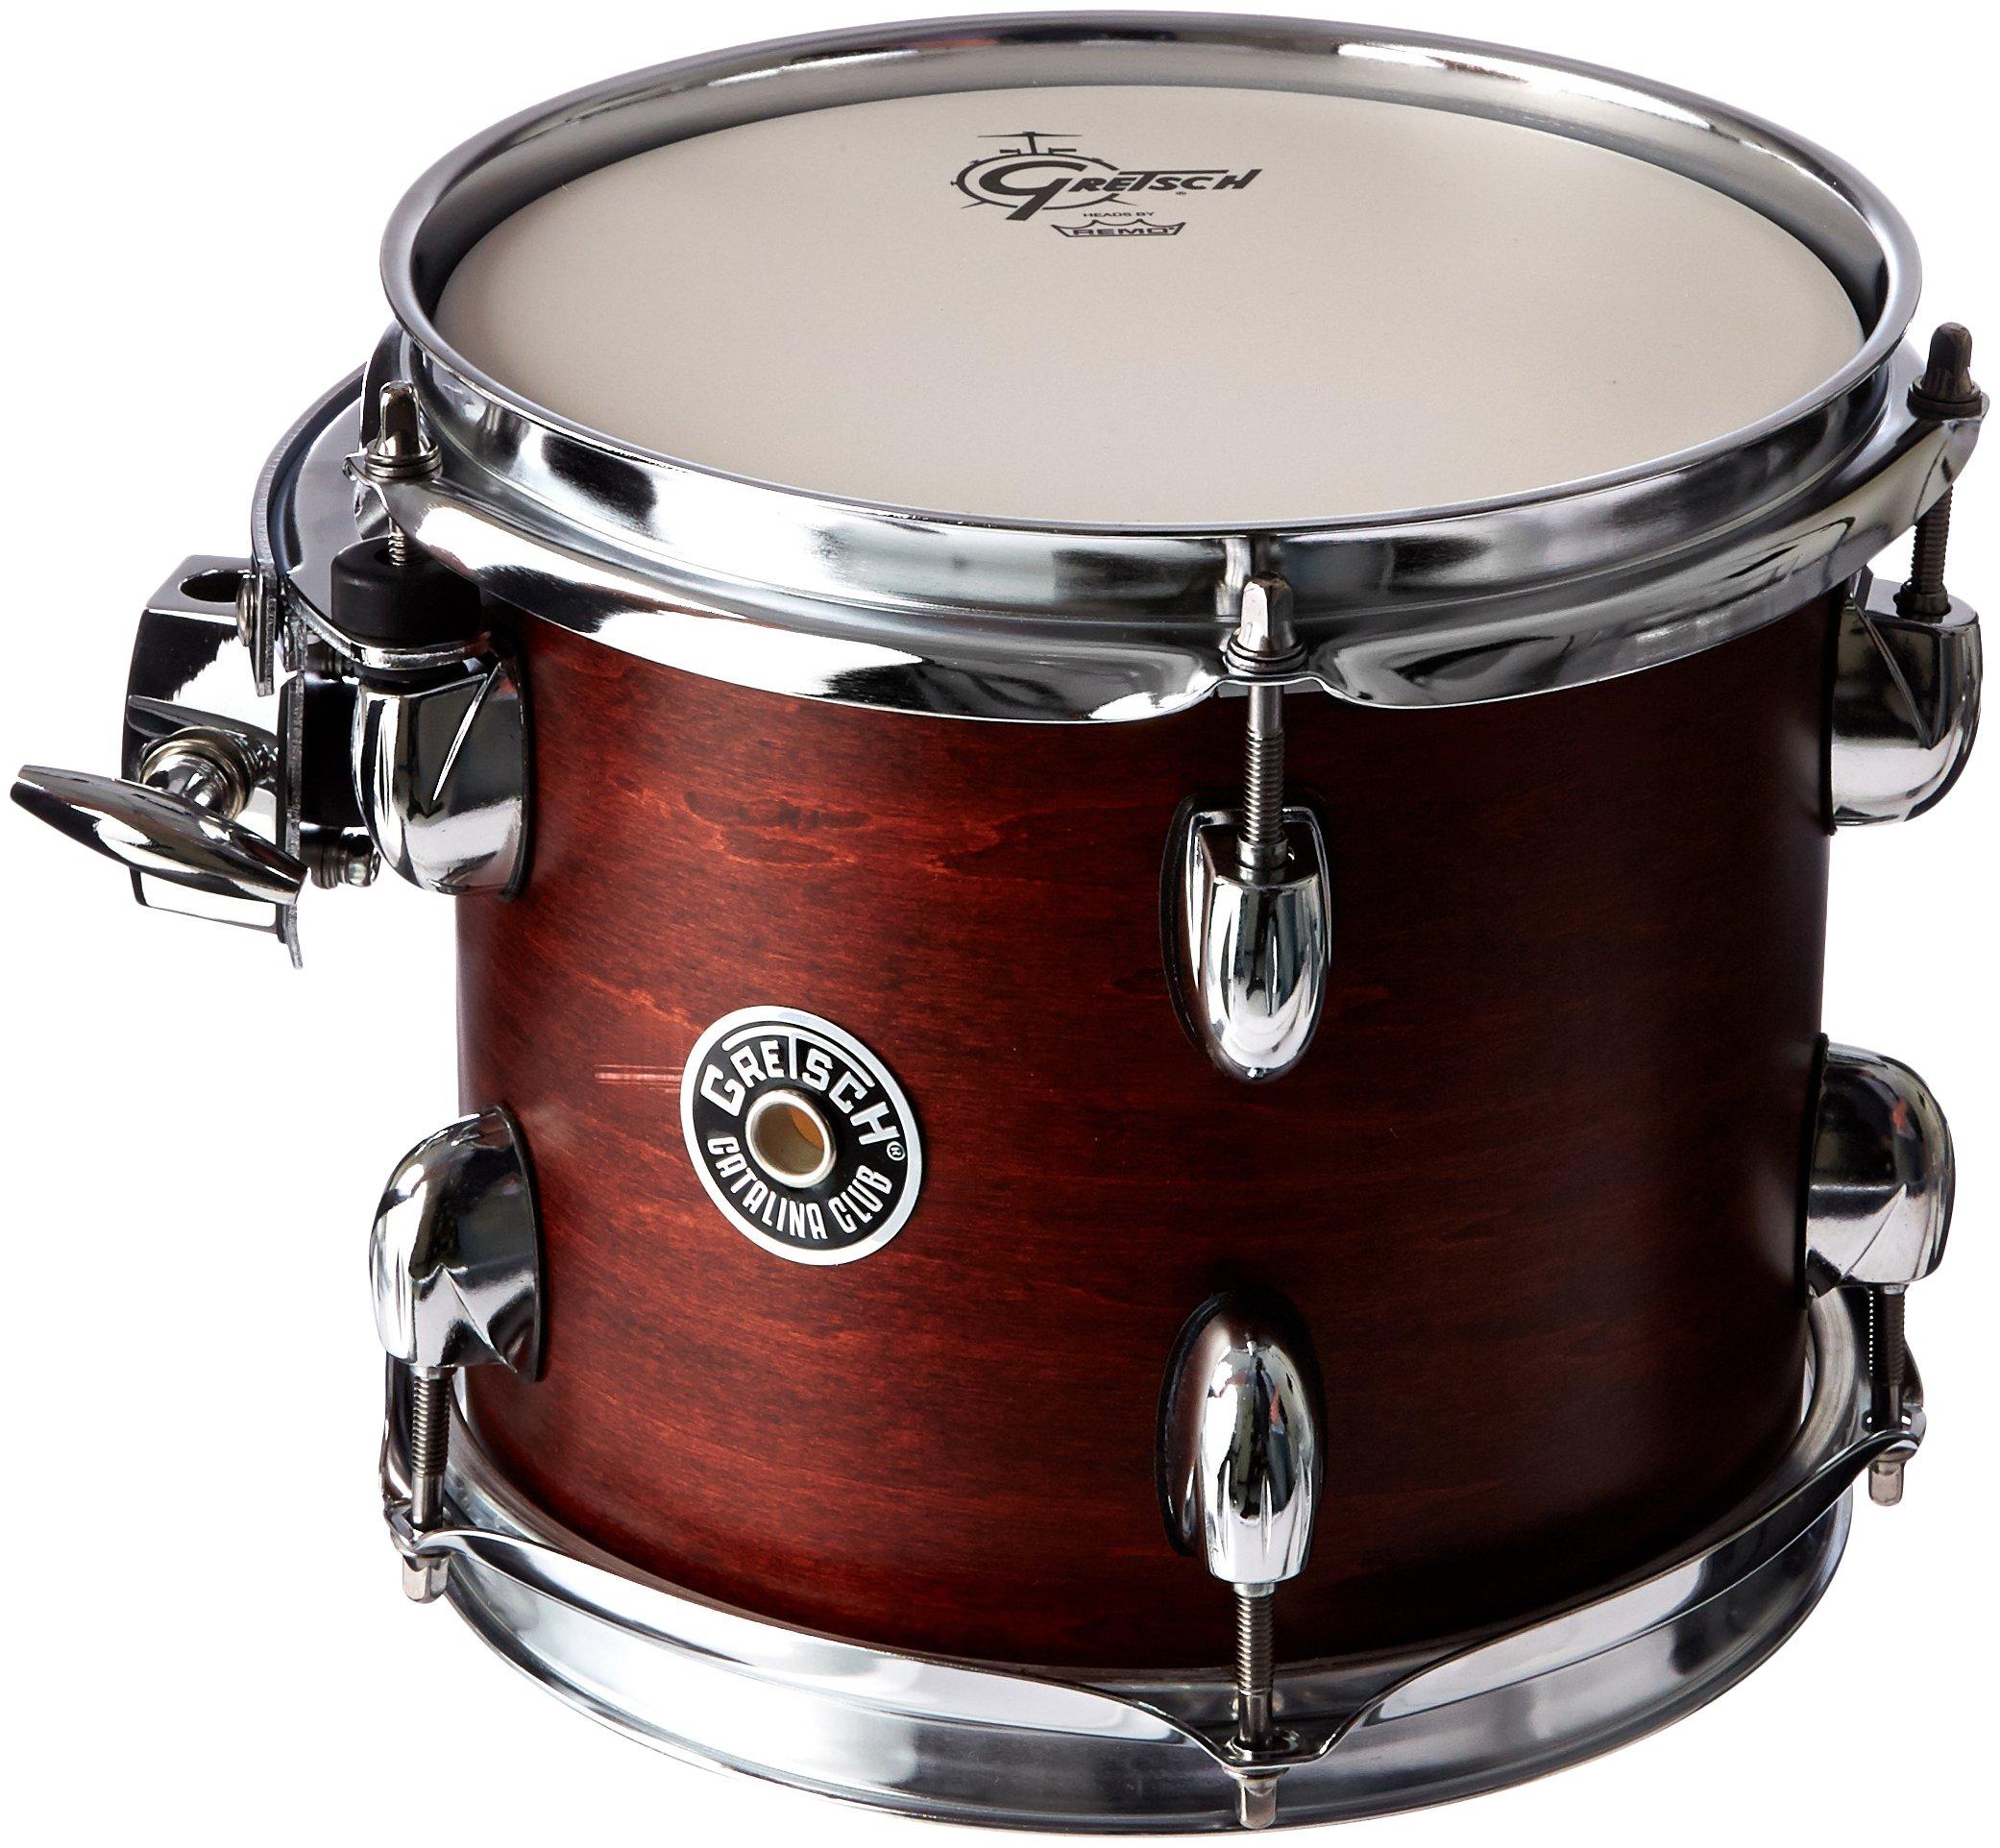 Gretsch Drums Catalina Club CT1-0708T-SWG Drum Set Rack Tom, Satin Walnut Glaze by Gretsch Drums